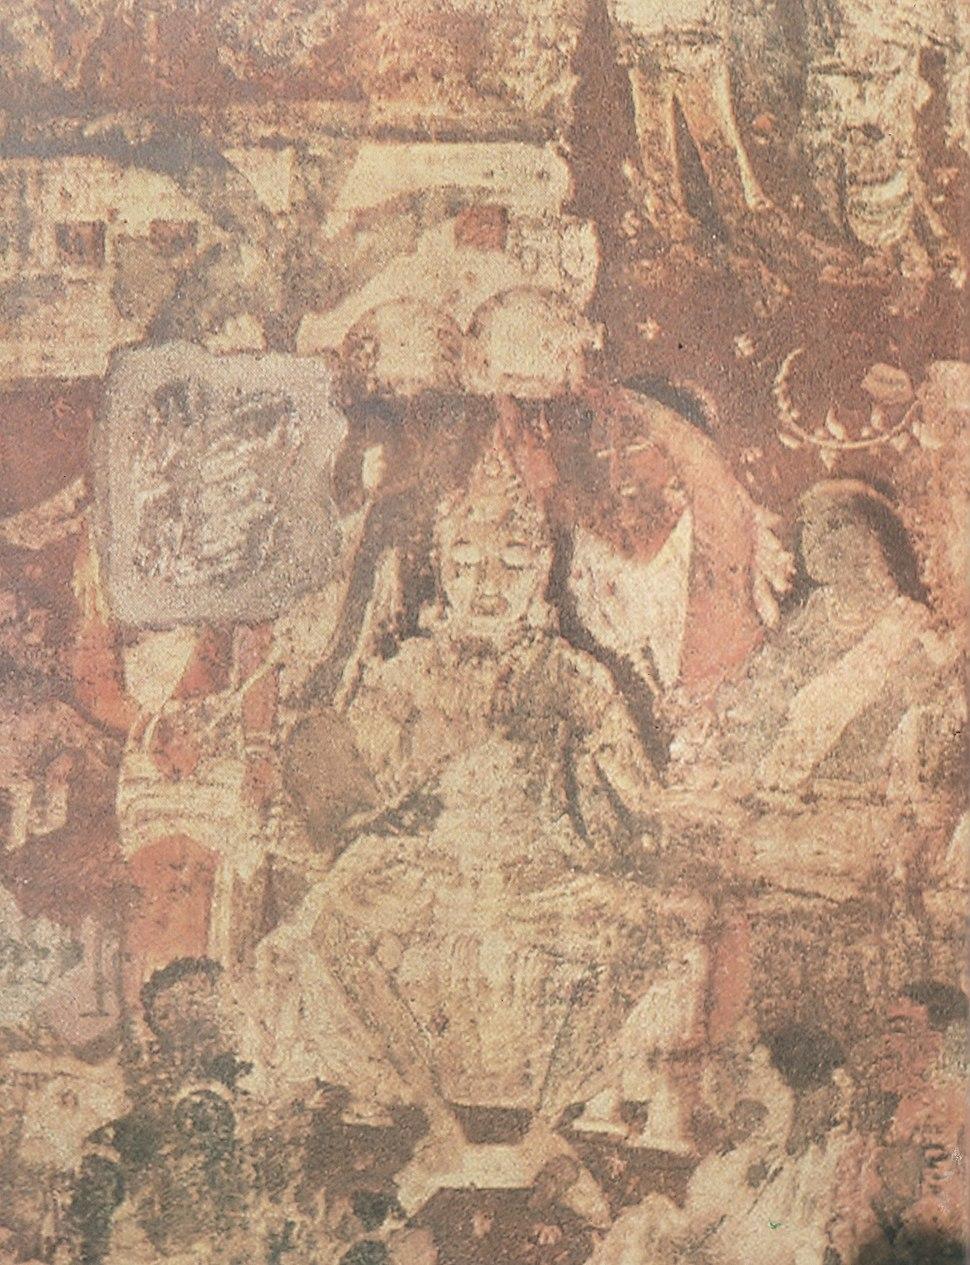 The Consecration Of King Sinhala-Prince Vijaya (Detail From The Ajanta Mural Of Cave No 17)